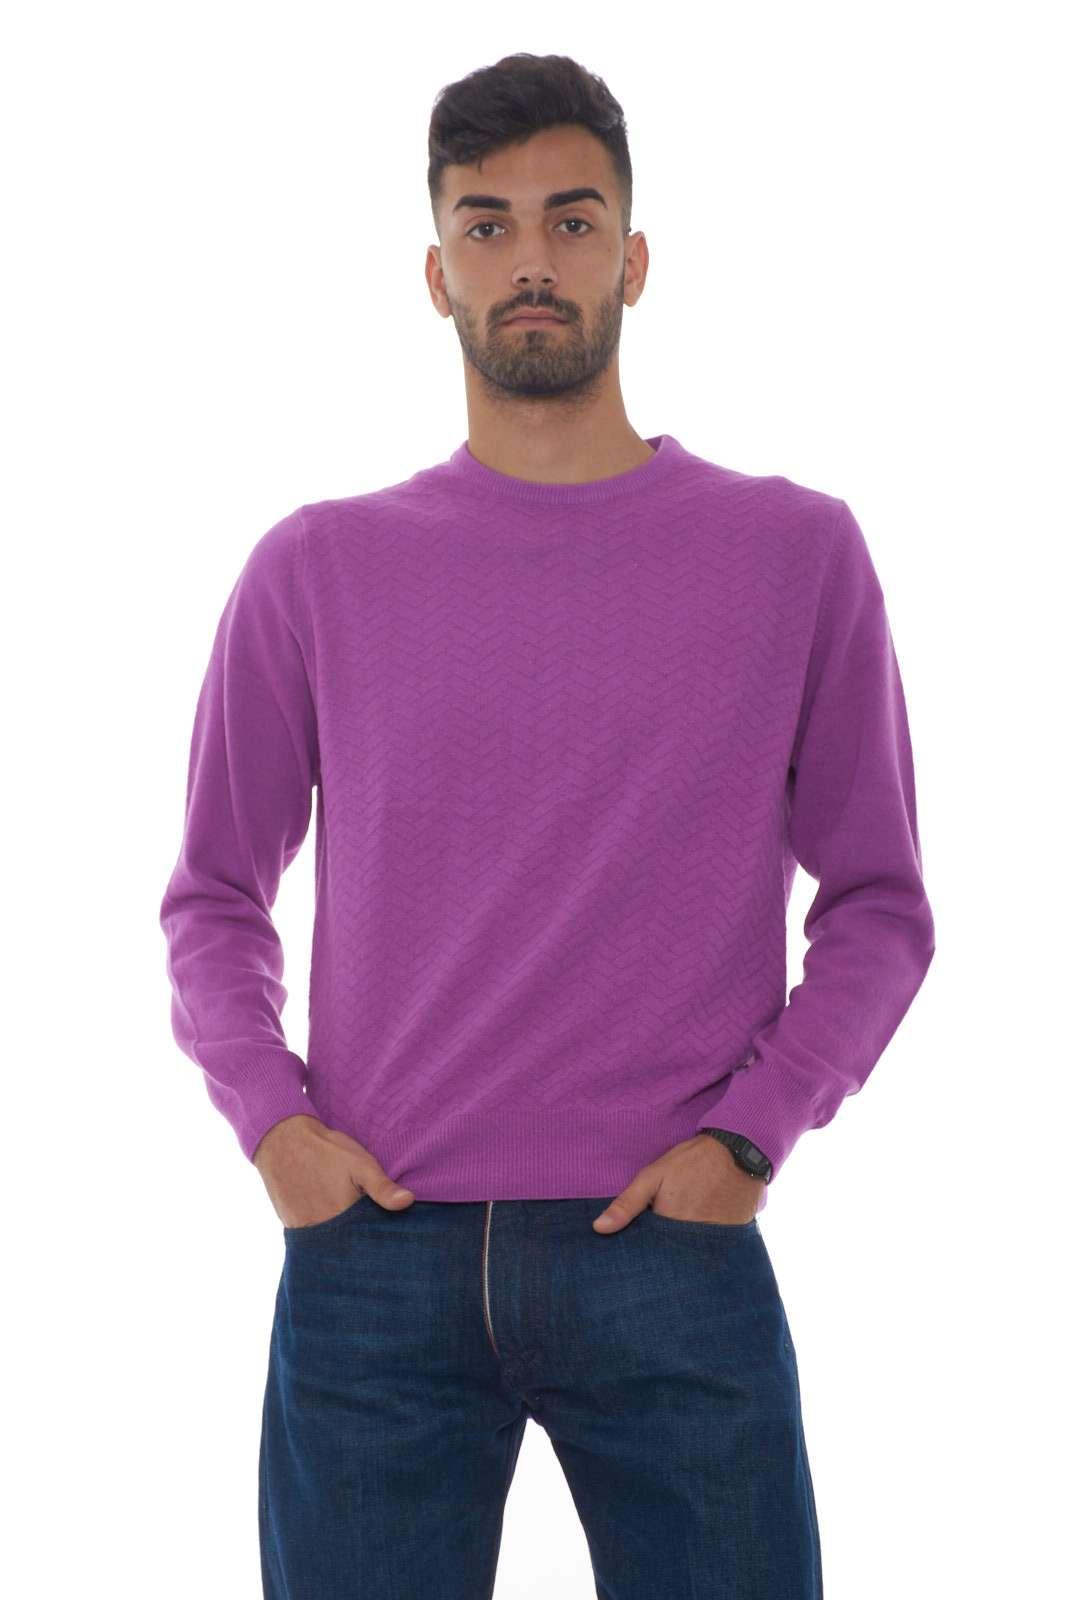 https://www.parmax.com/media/catalog/product/a/i/AI-outlet_parmax-maglia-uomo-Acquapura-0011-A.jpg